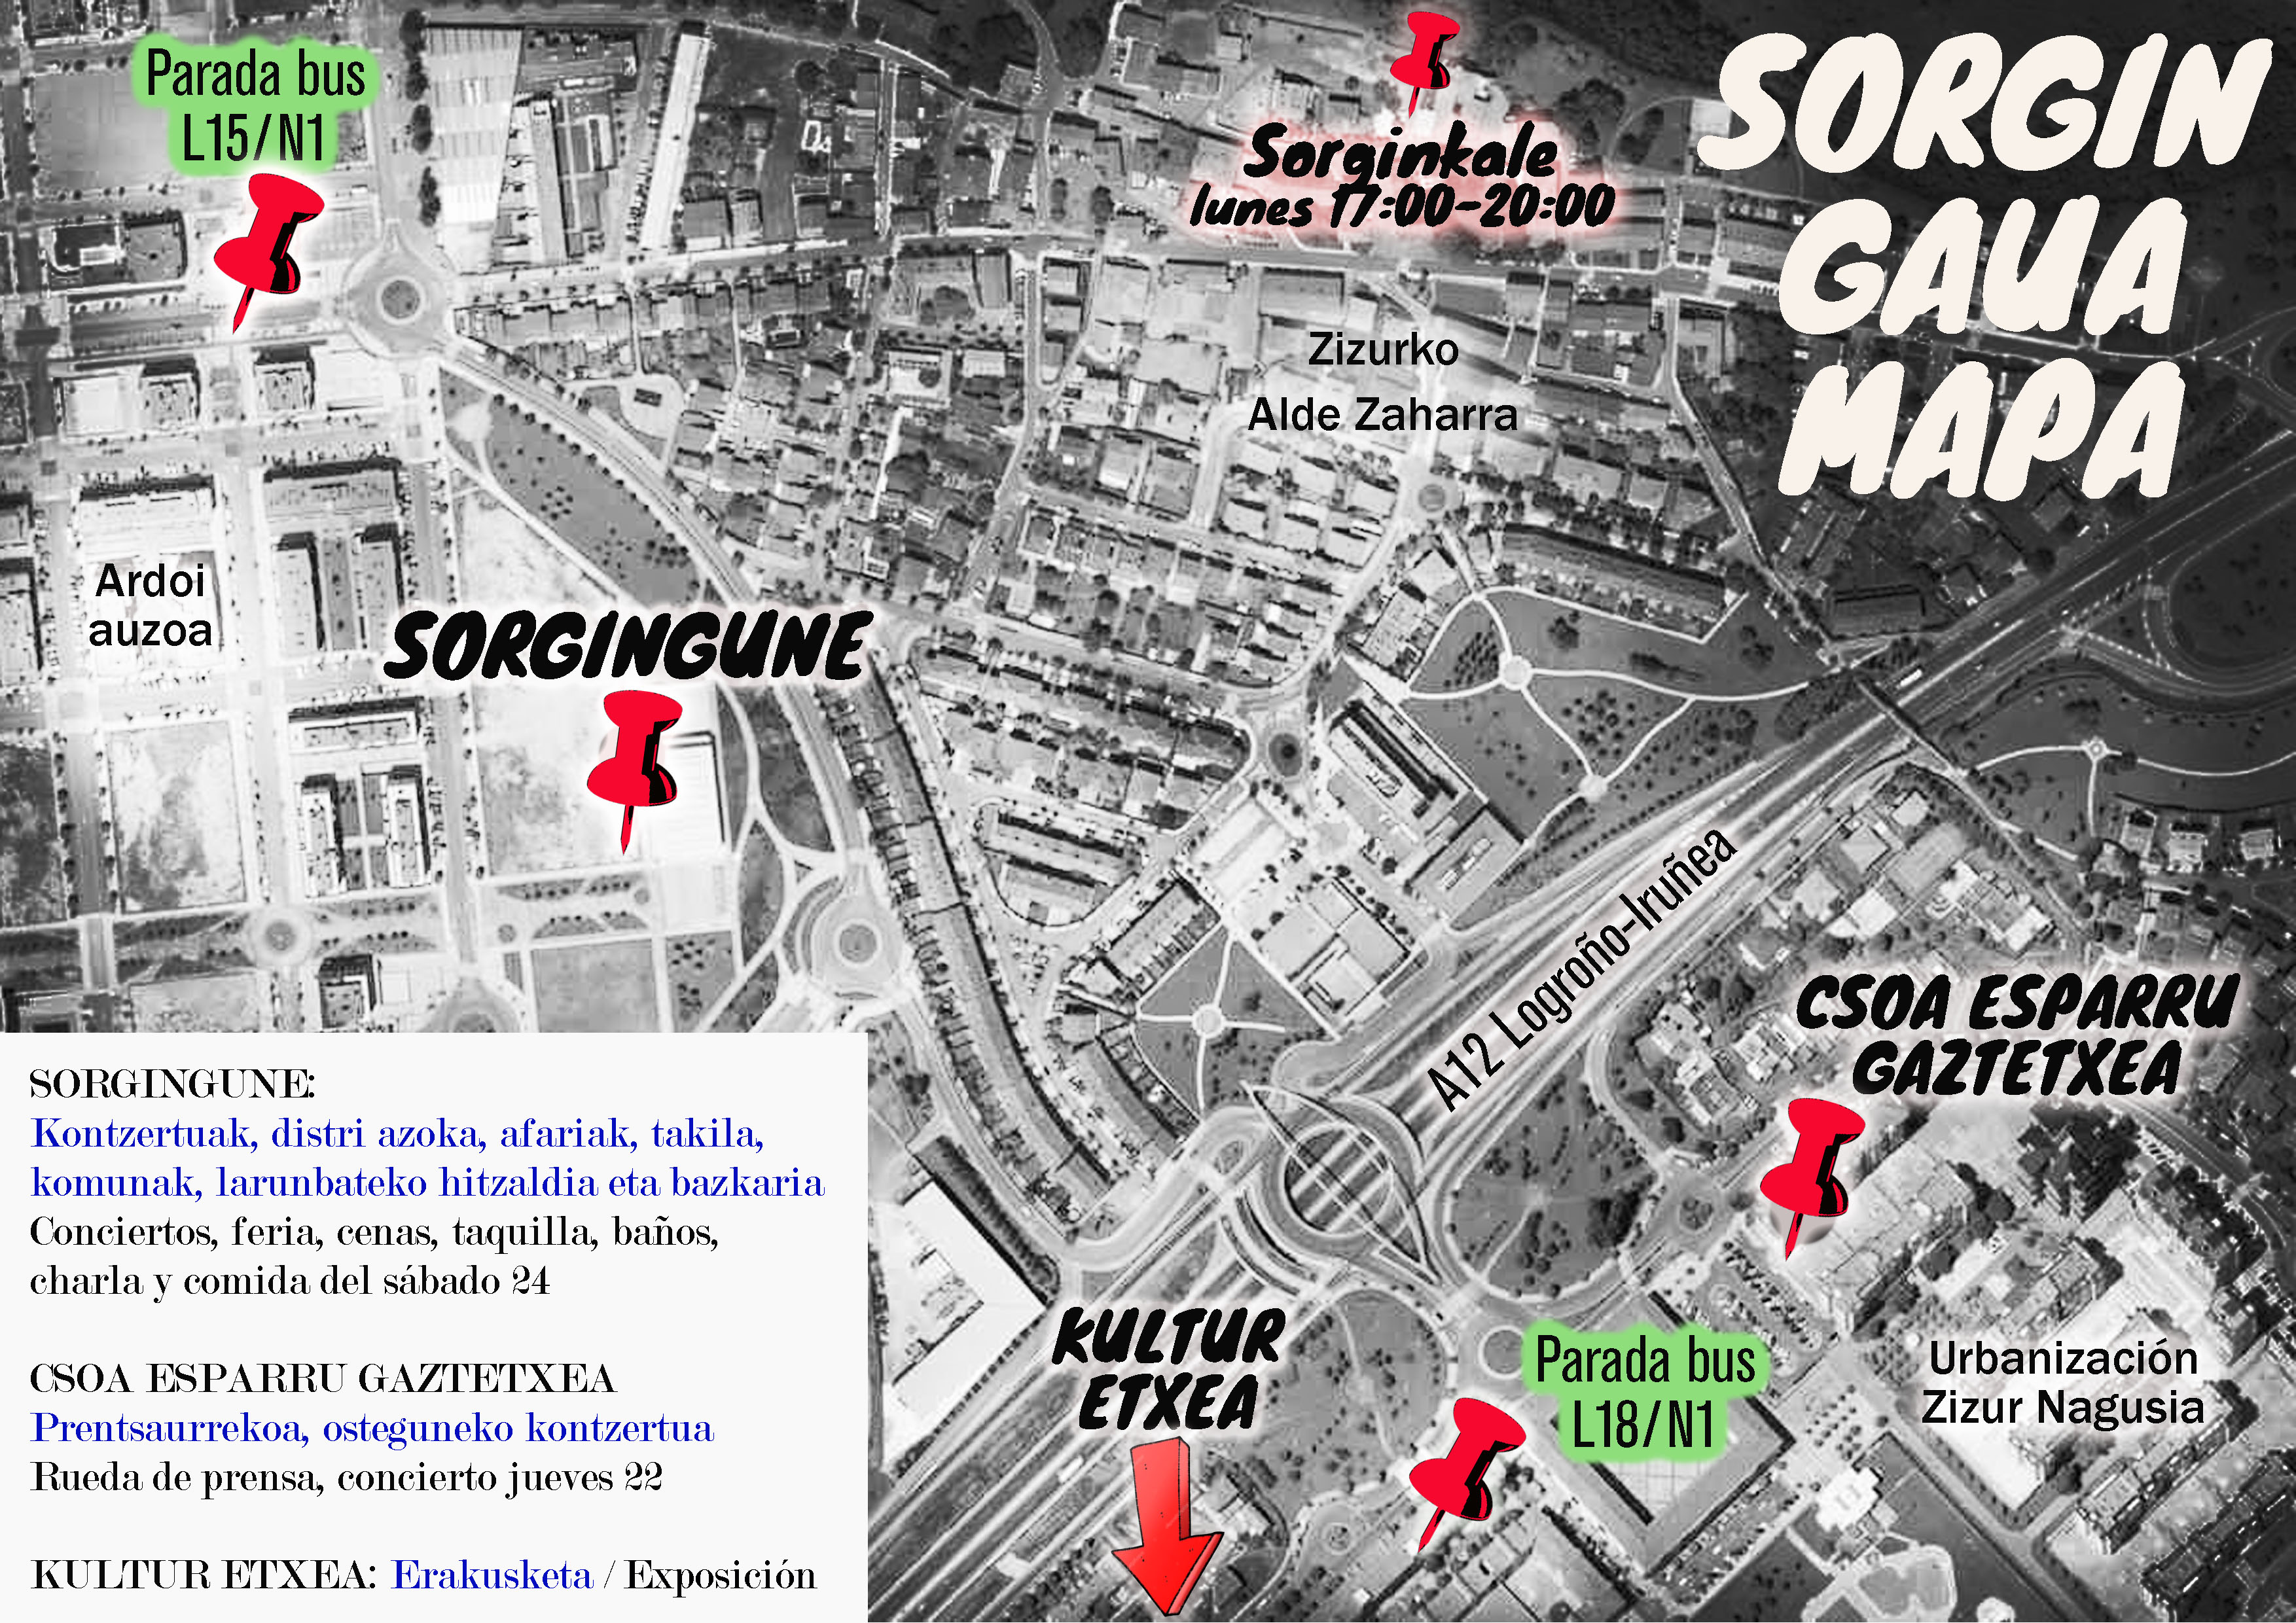 mapasorgin.jpg